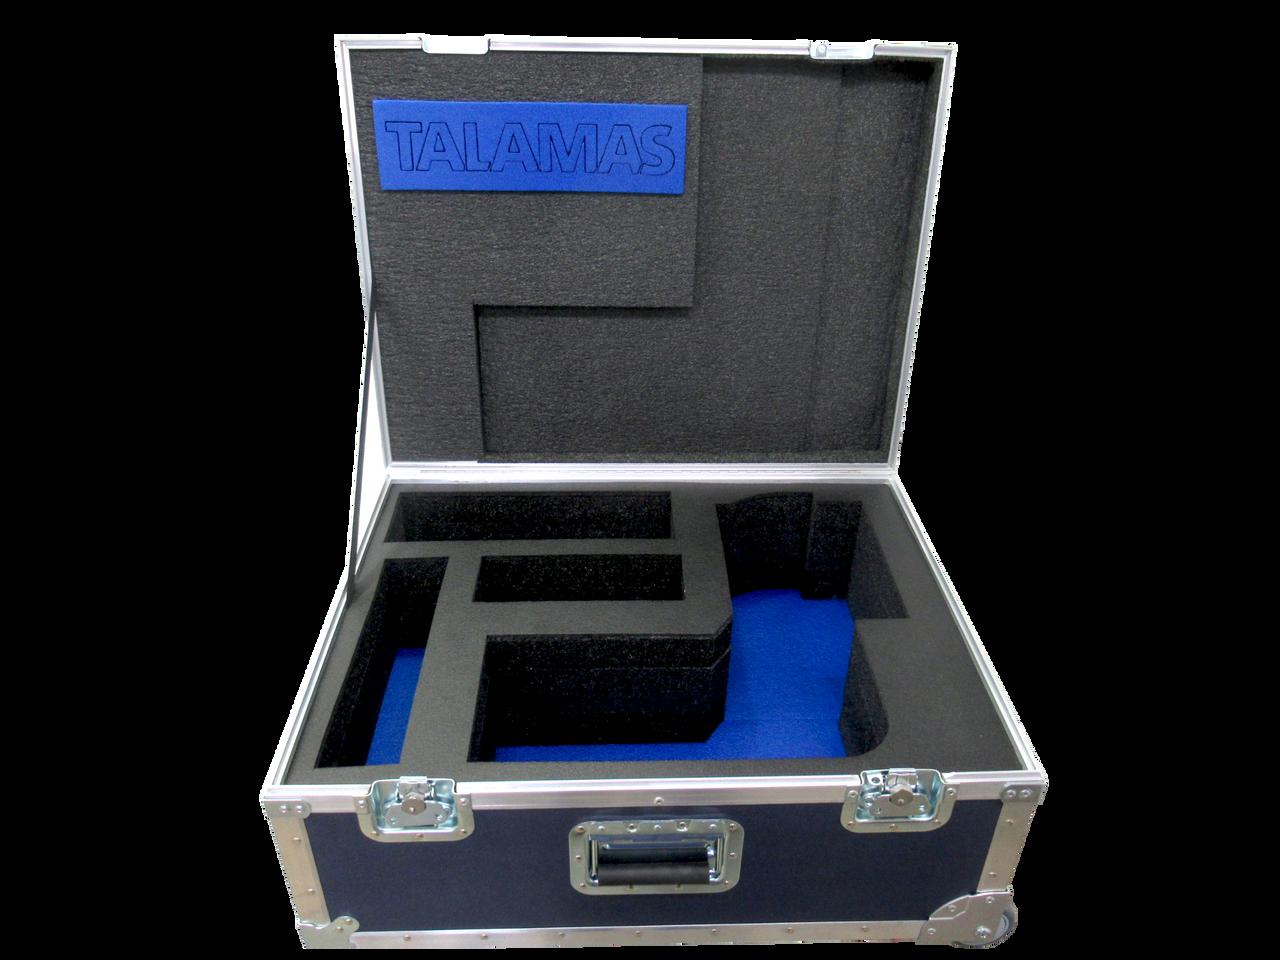 Cartoni Lambda Head 25 3rd Axis Shipping Case